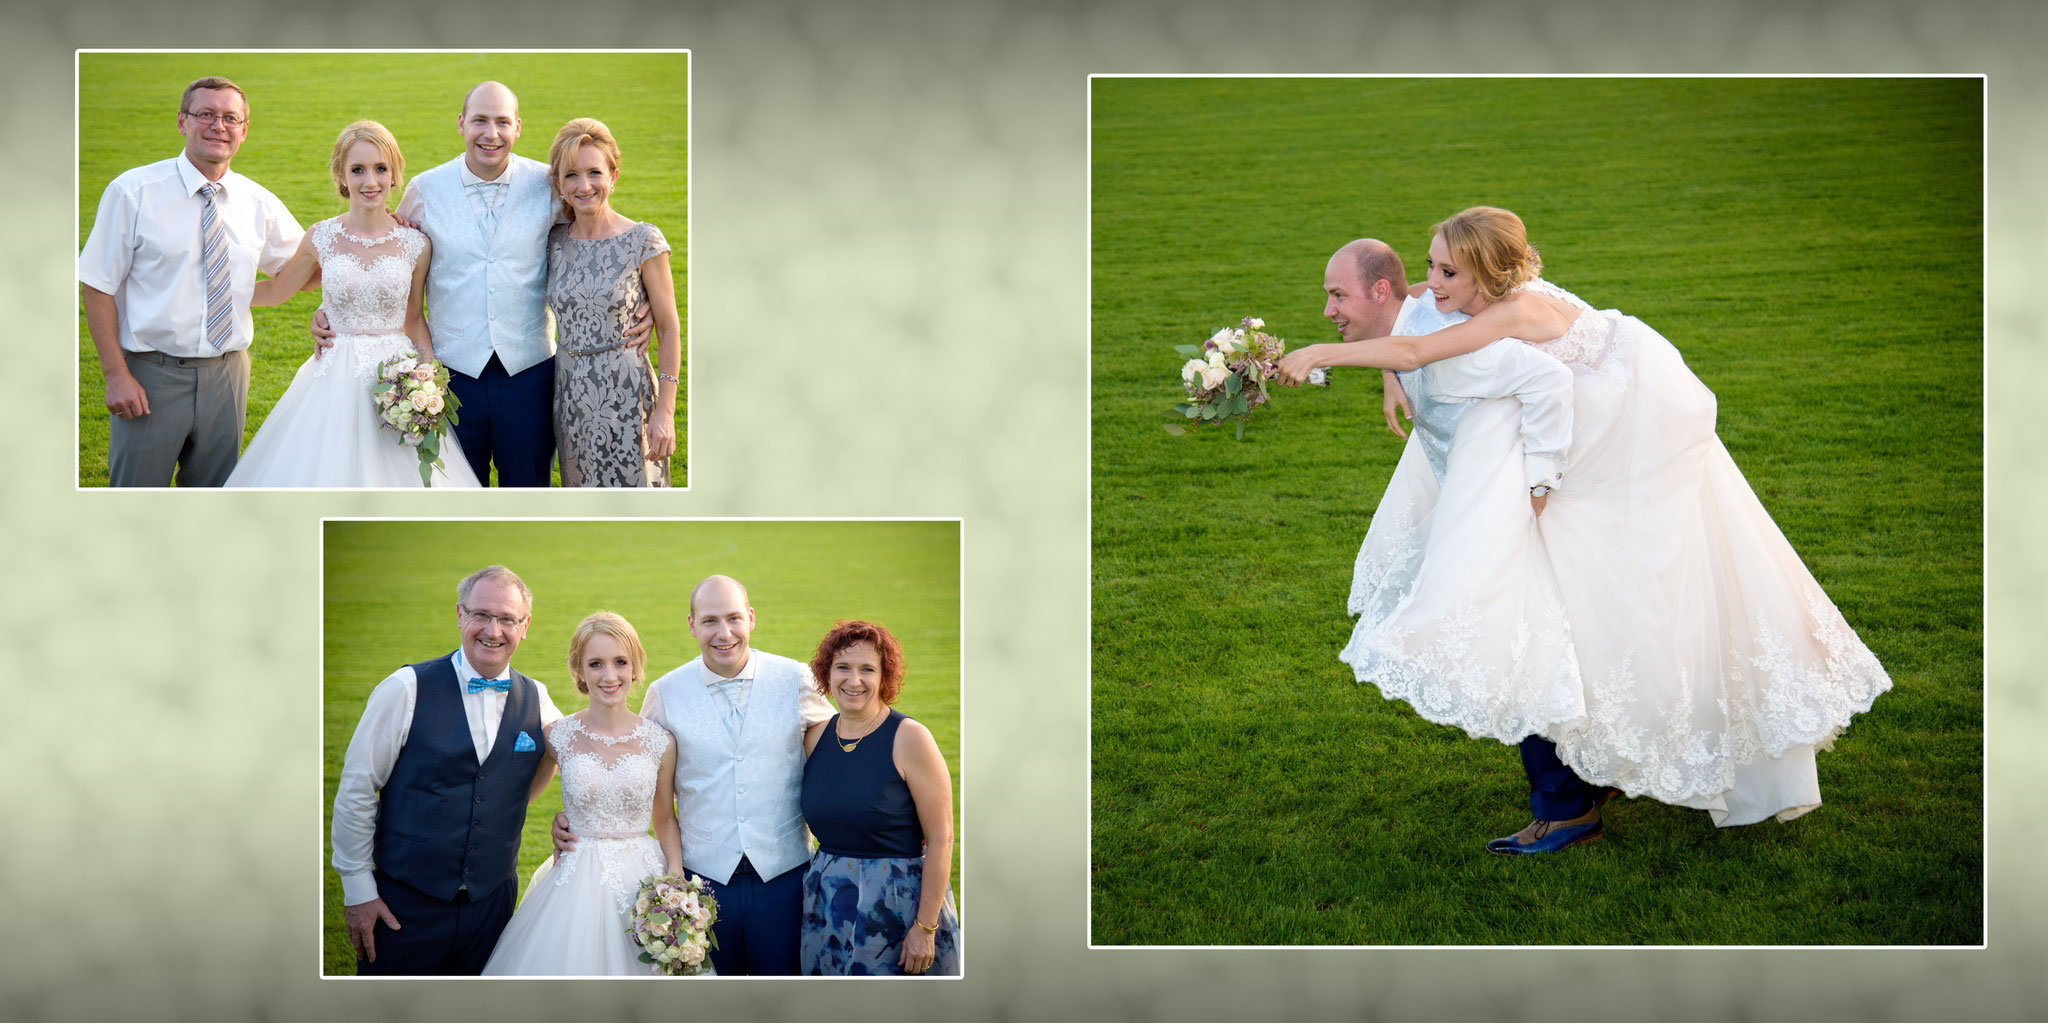 Hochzeitsfotografie Regenstauf  Burglengenfeld  Studio Alex